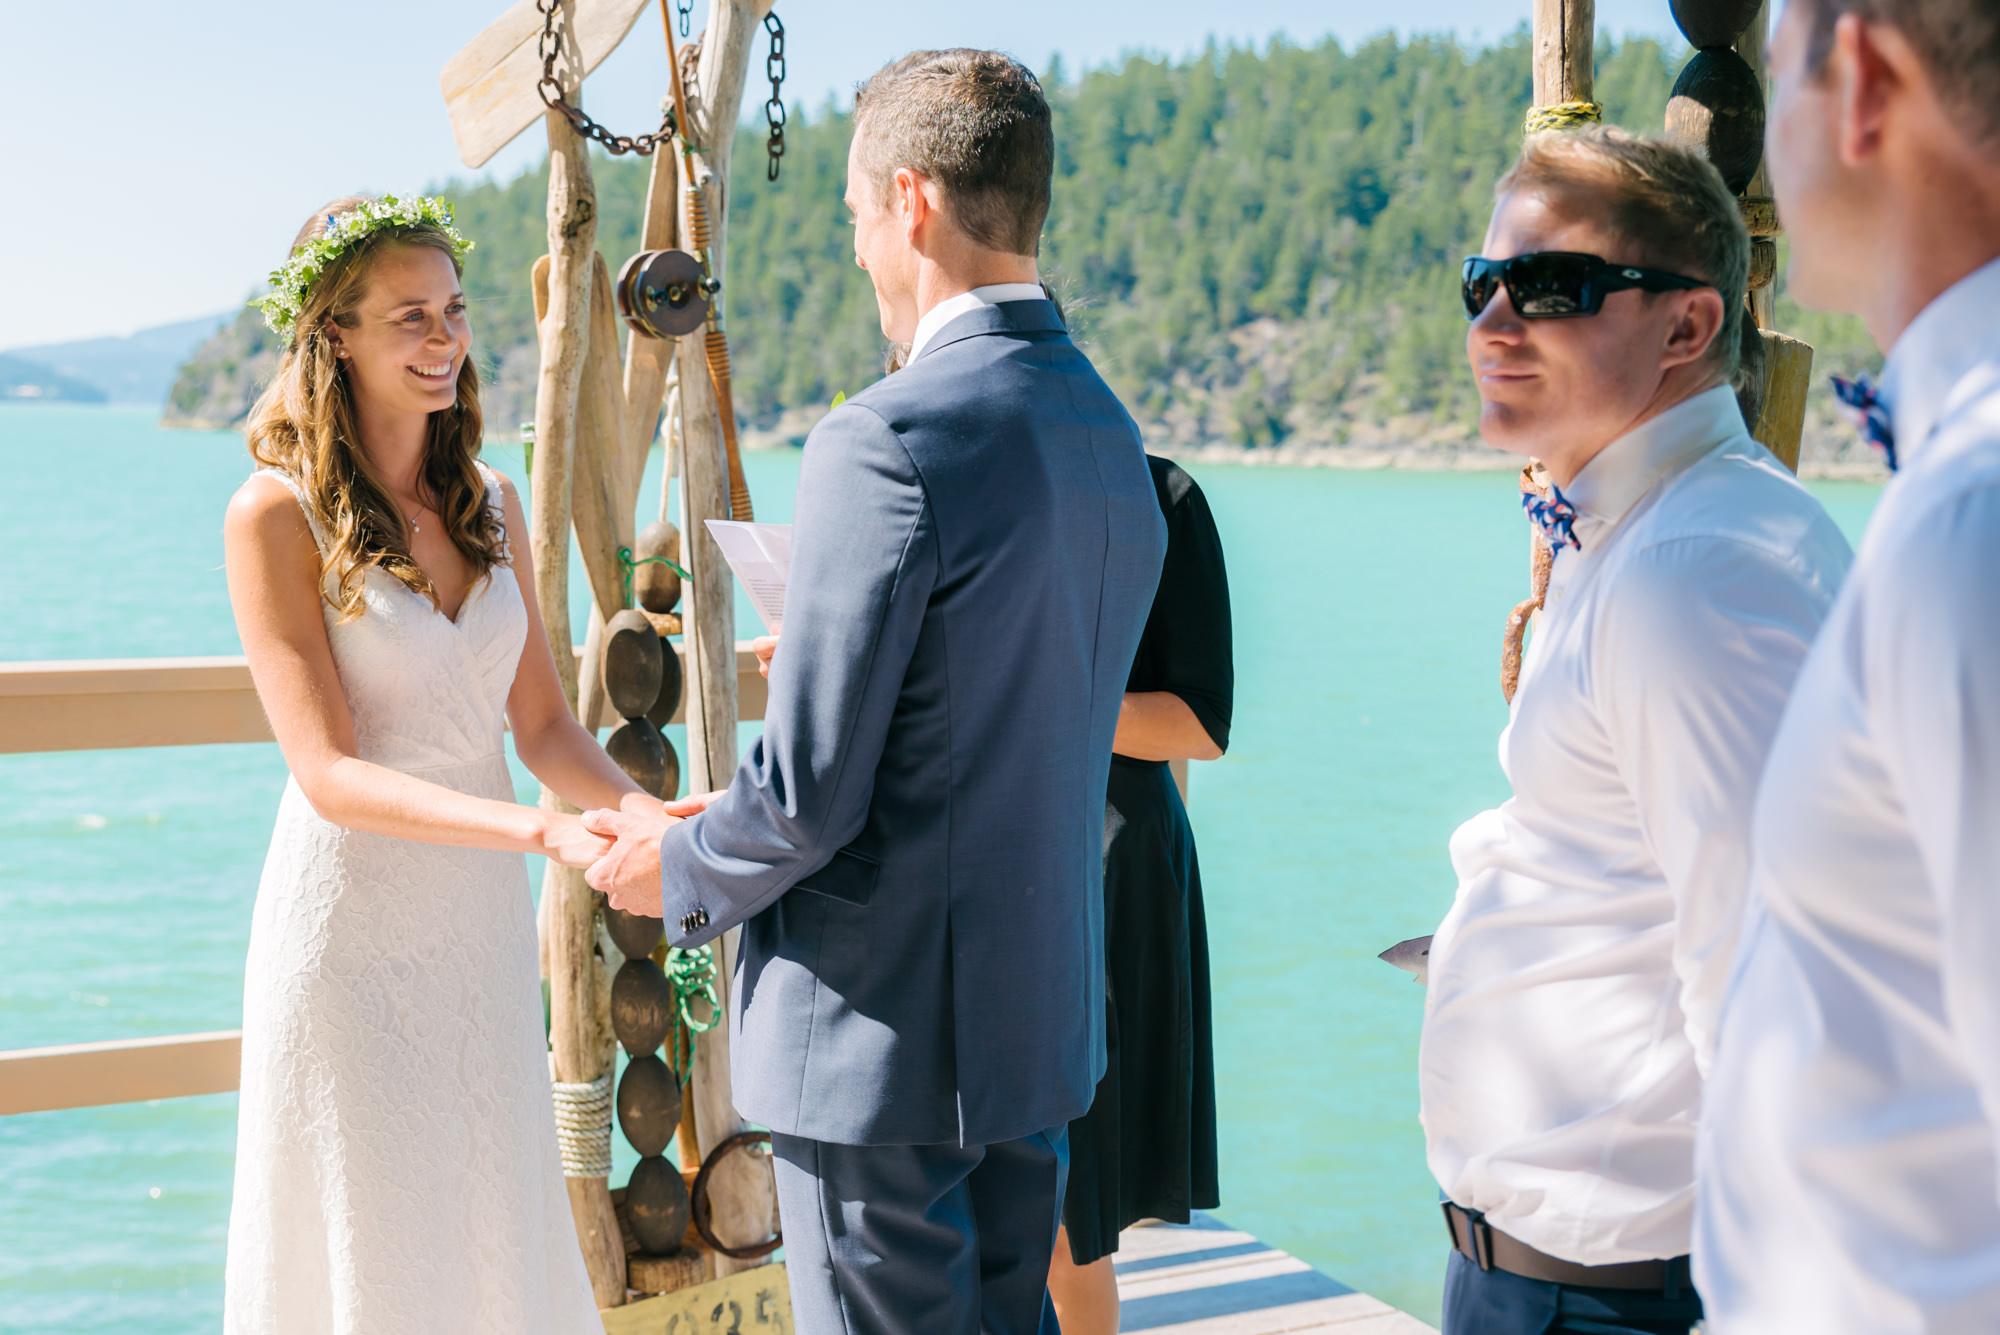 bowen_island_wedding_photographer_vancouver142005_7_ally&james.jpg